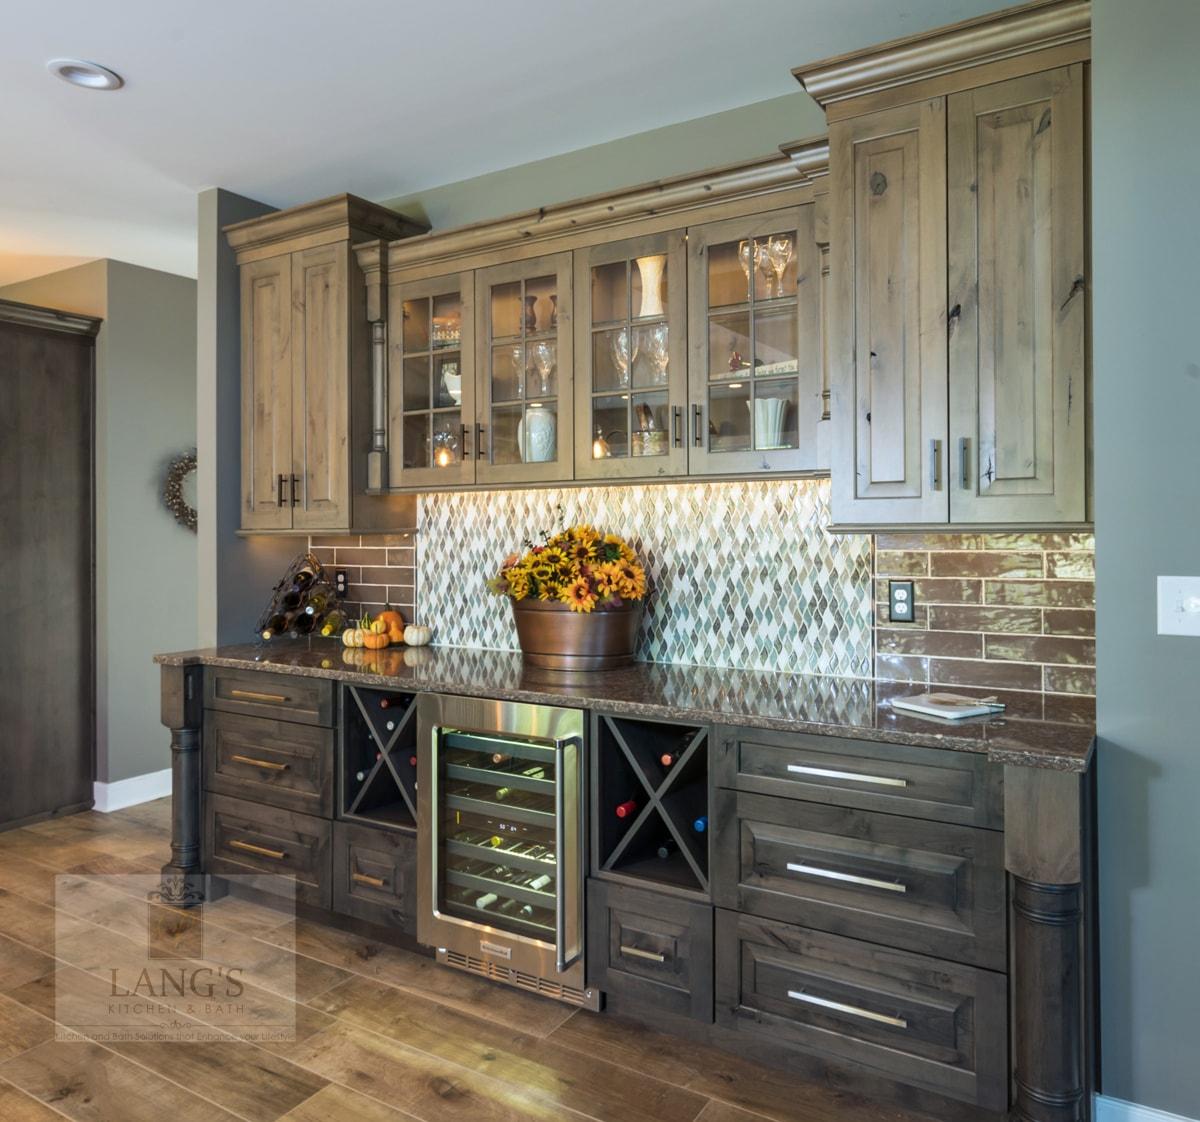 Webb kitchen design 7_web-min.jpg